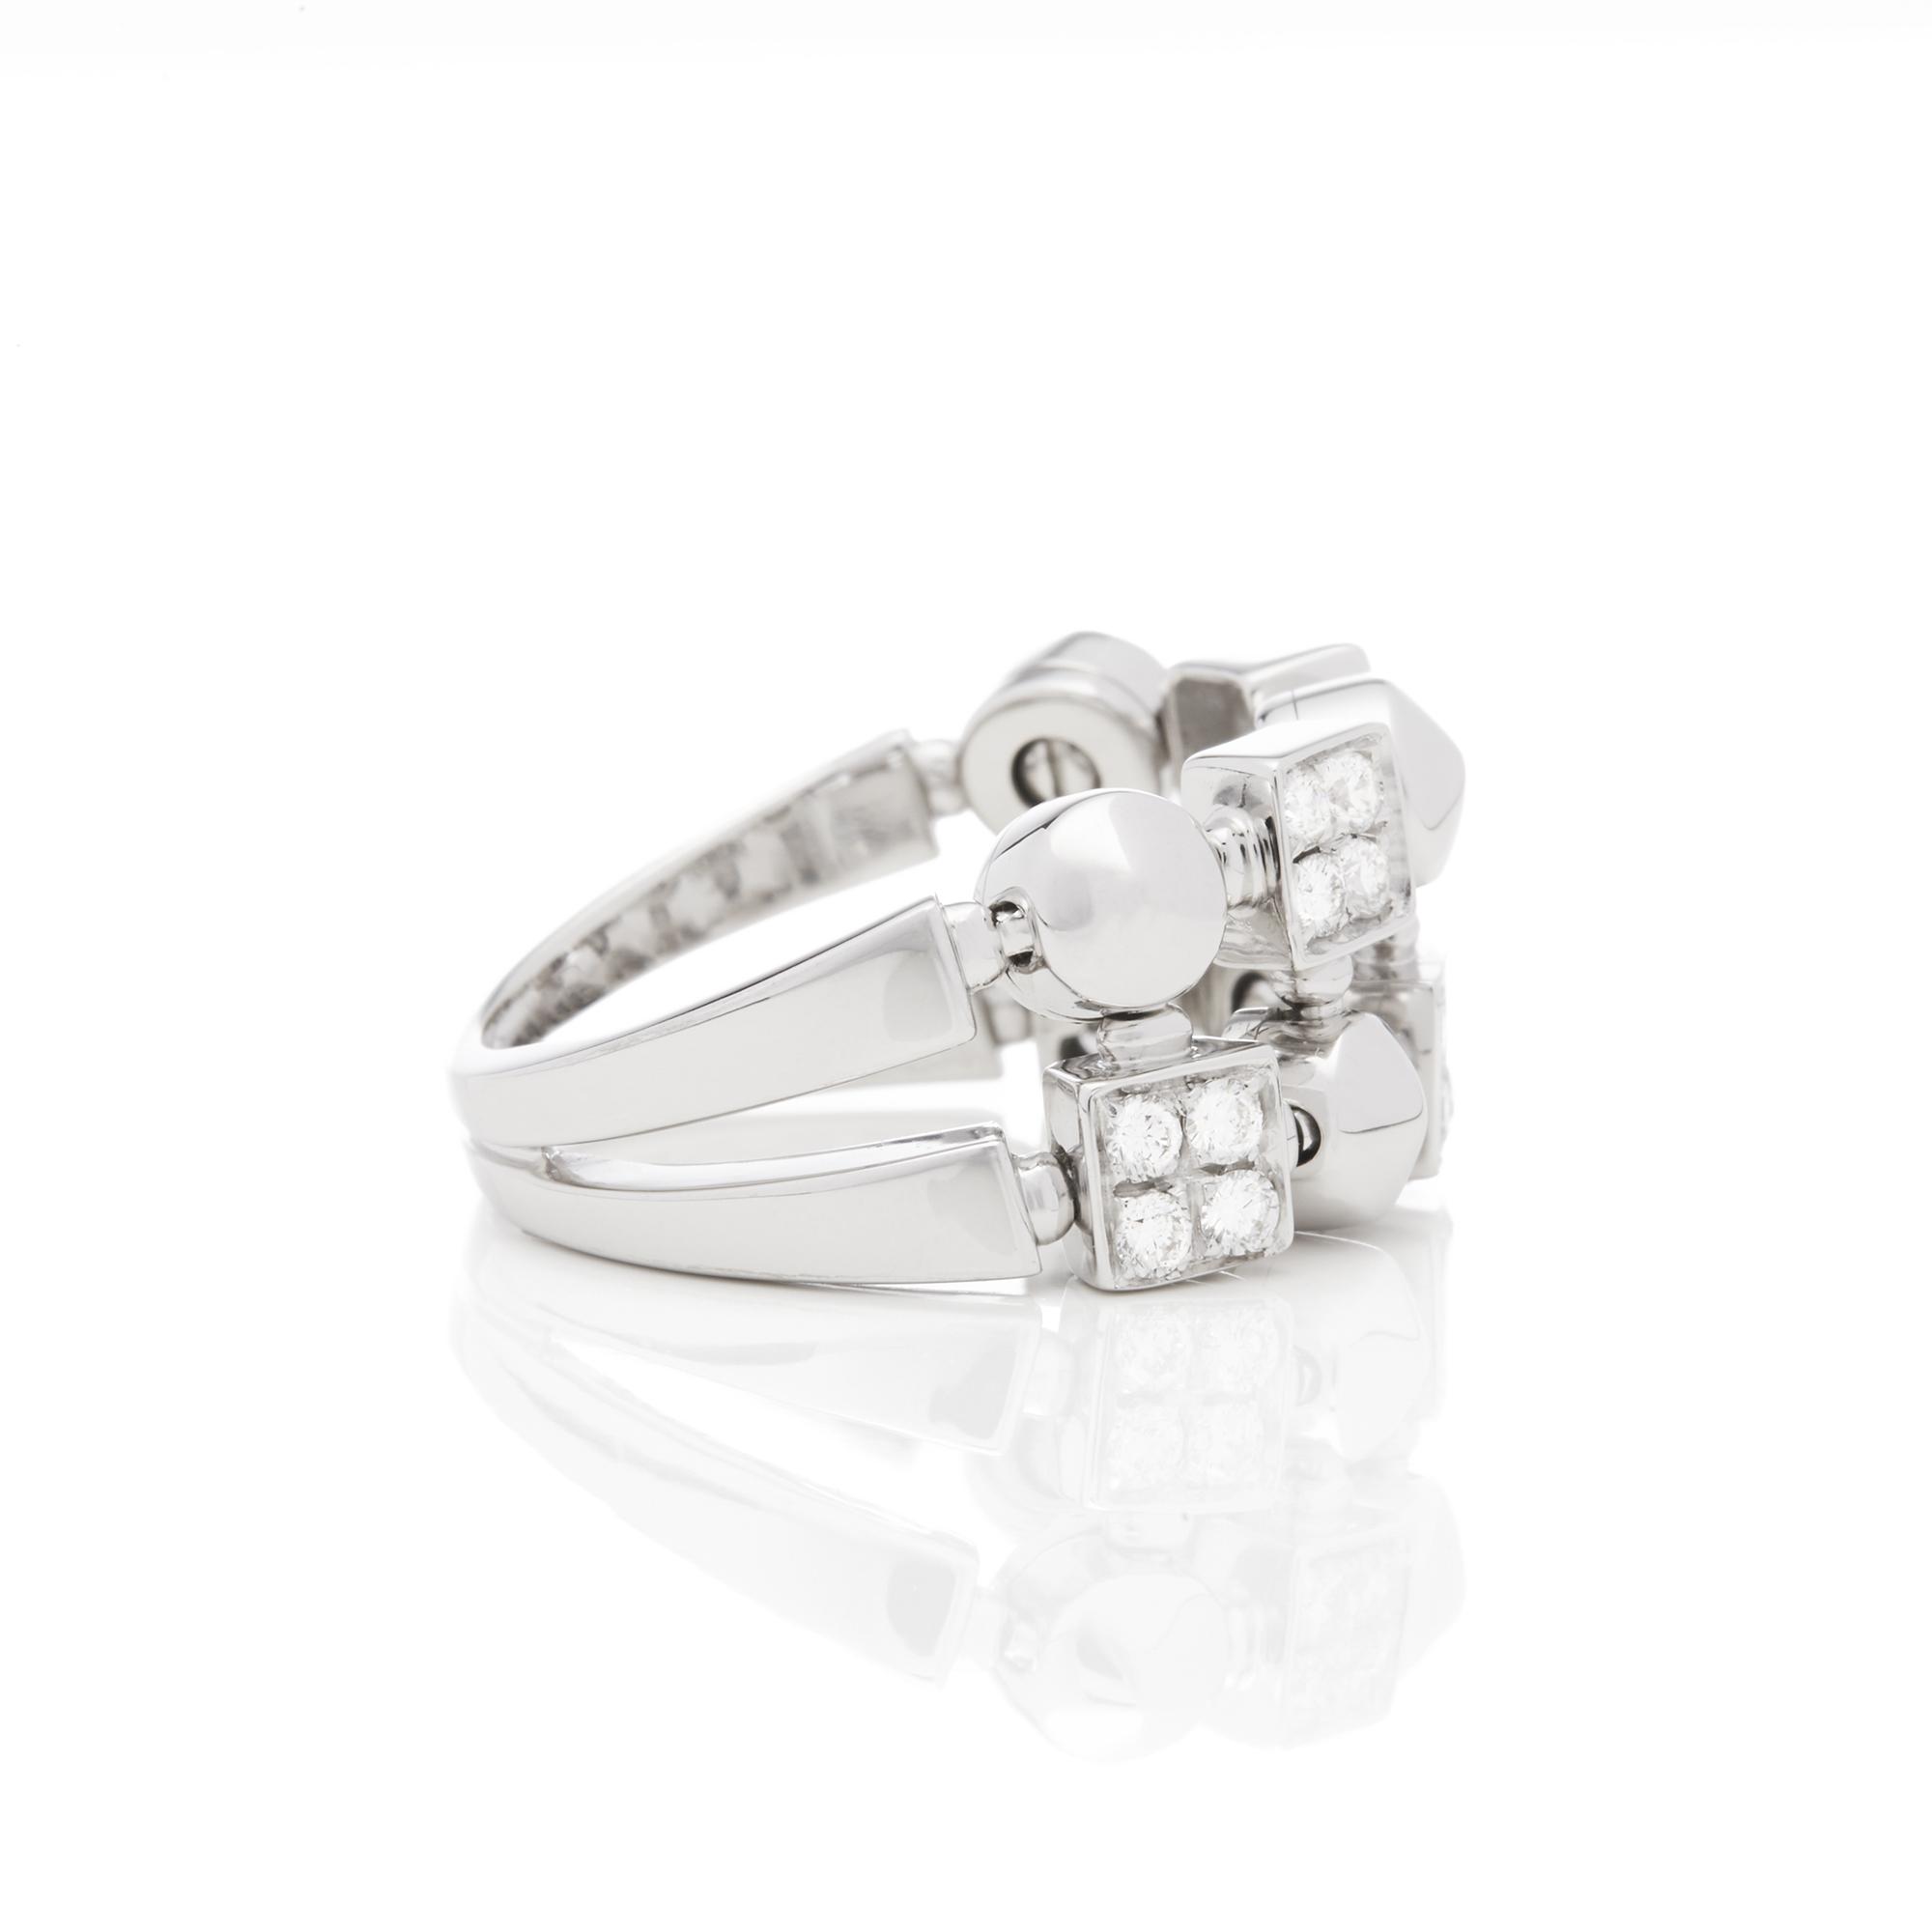 Bulgari 18ct White Gold Lucéa Diamond Ring - Image 6 of 7